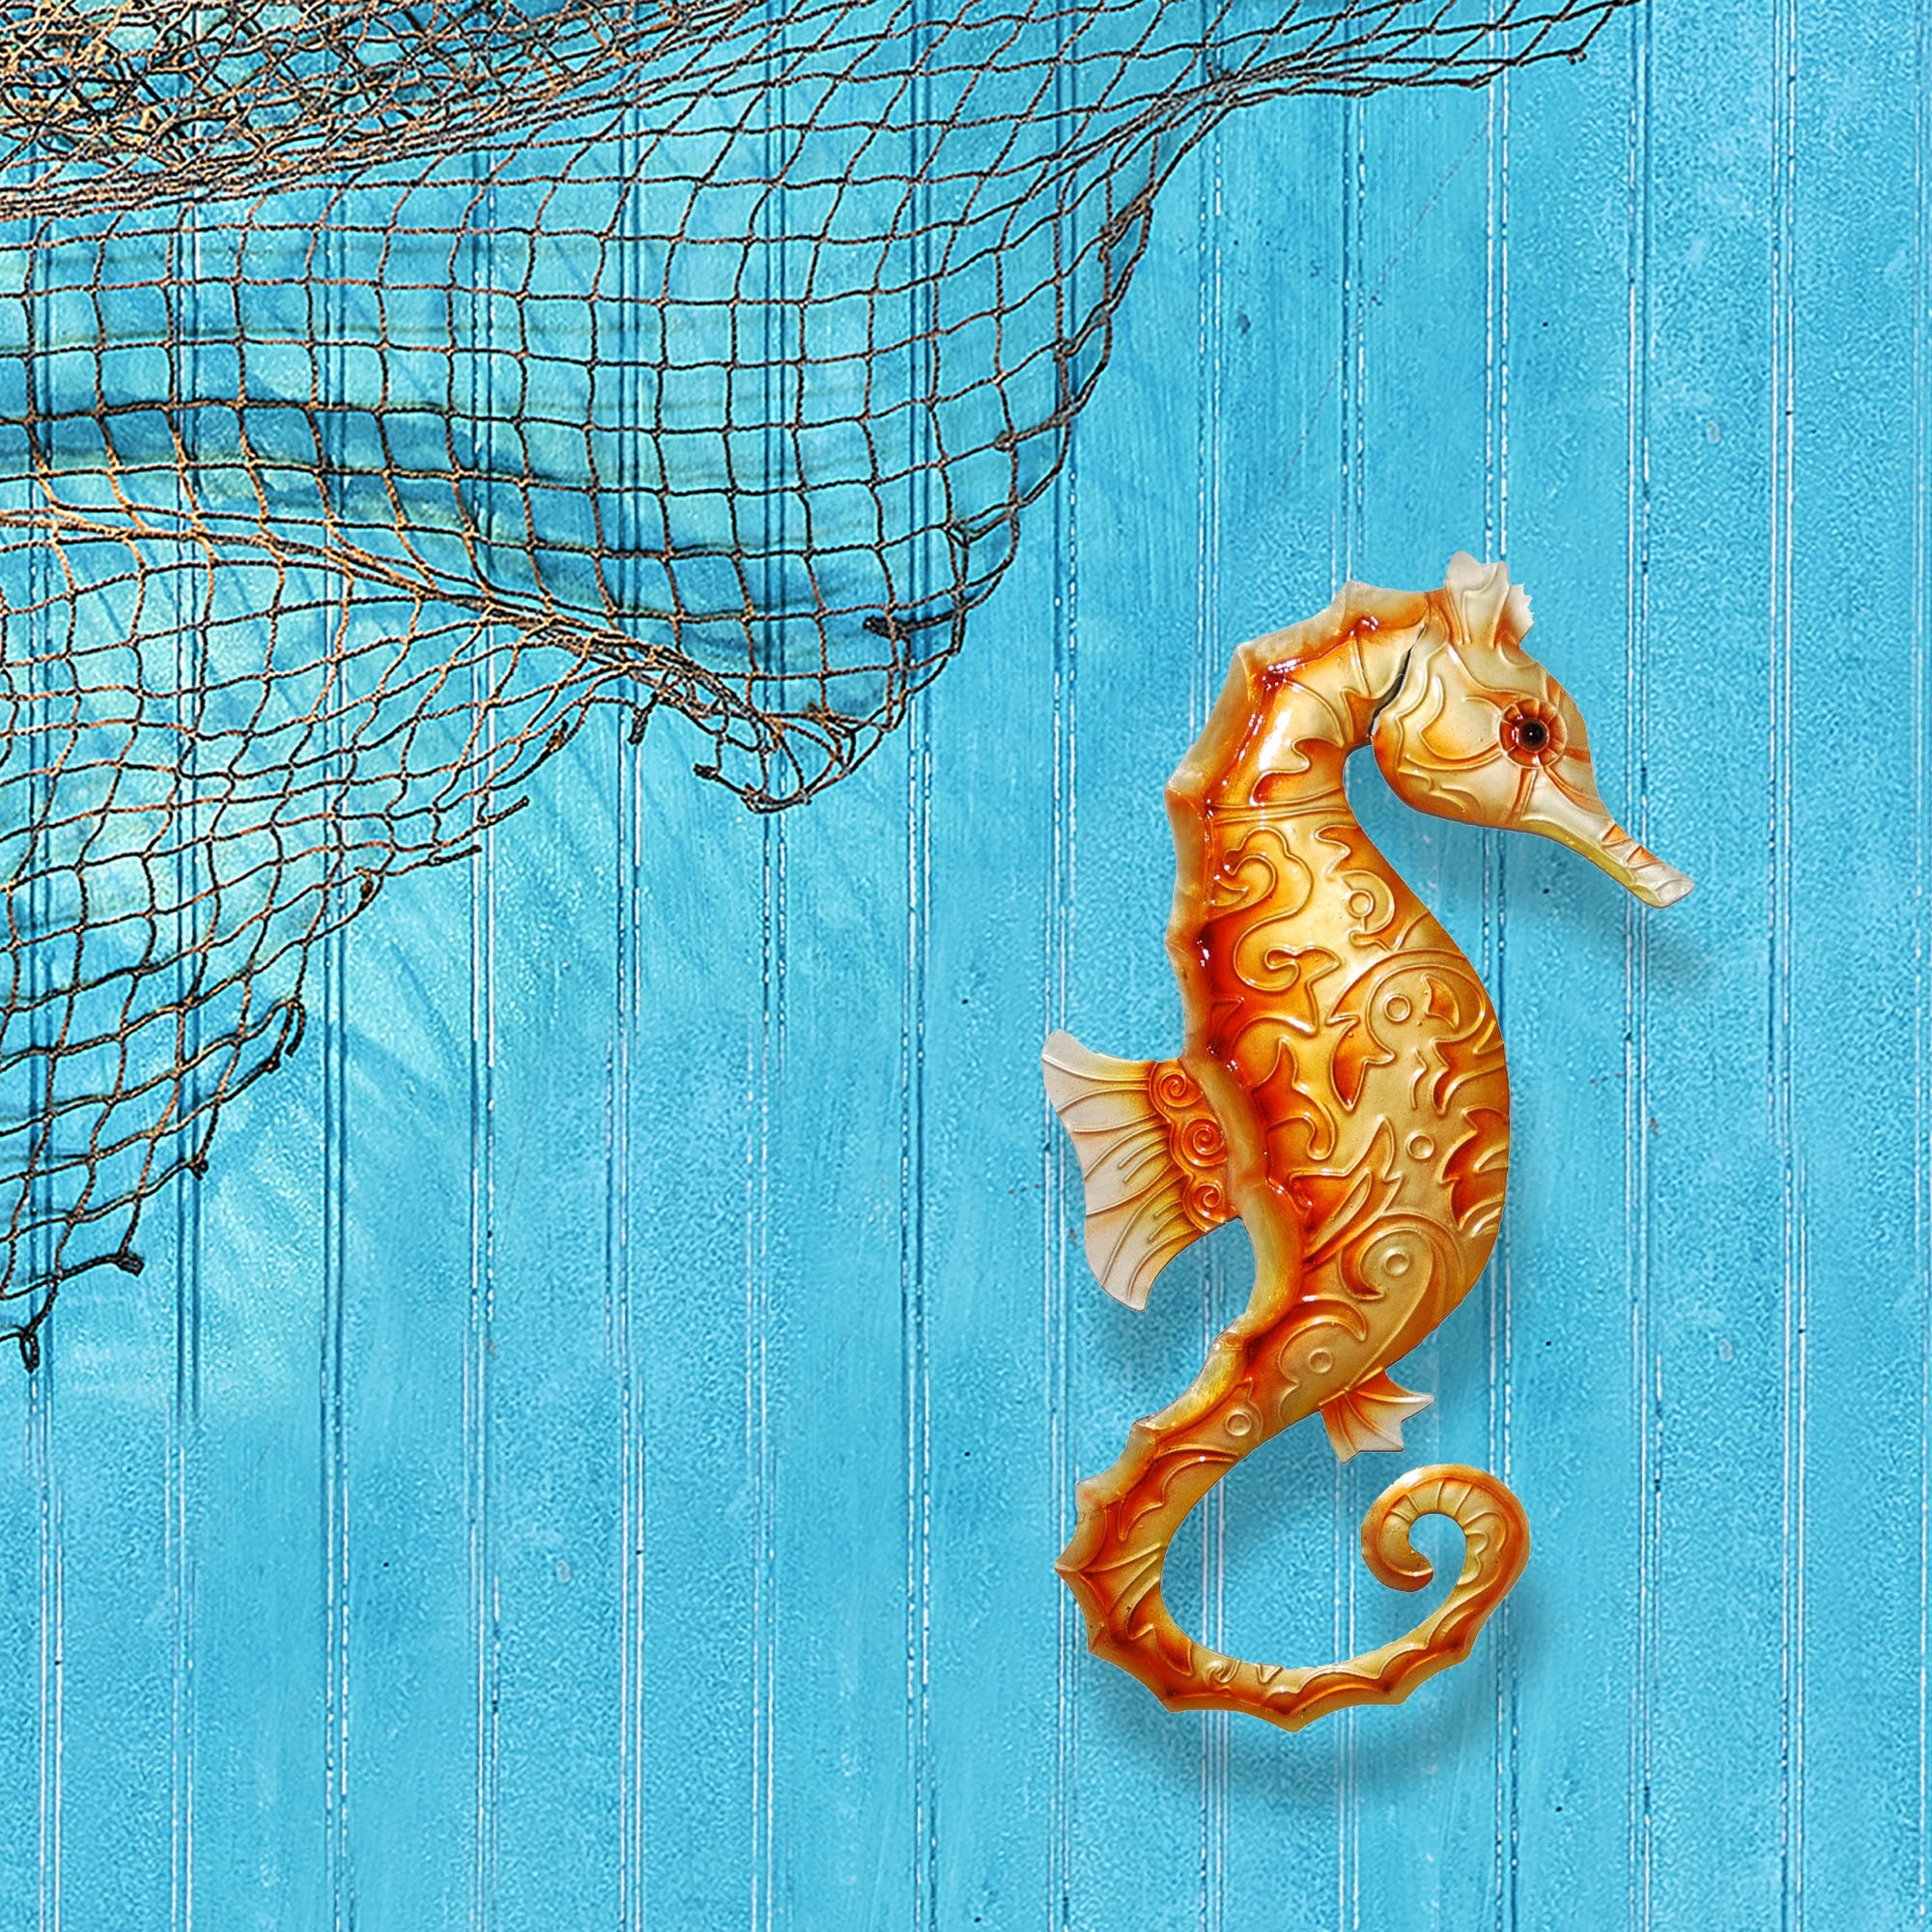 Wall Seahorse Orange 6 X 1 X 12 Overstock 18801955